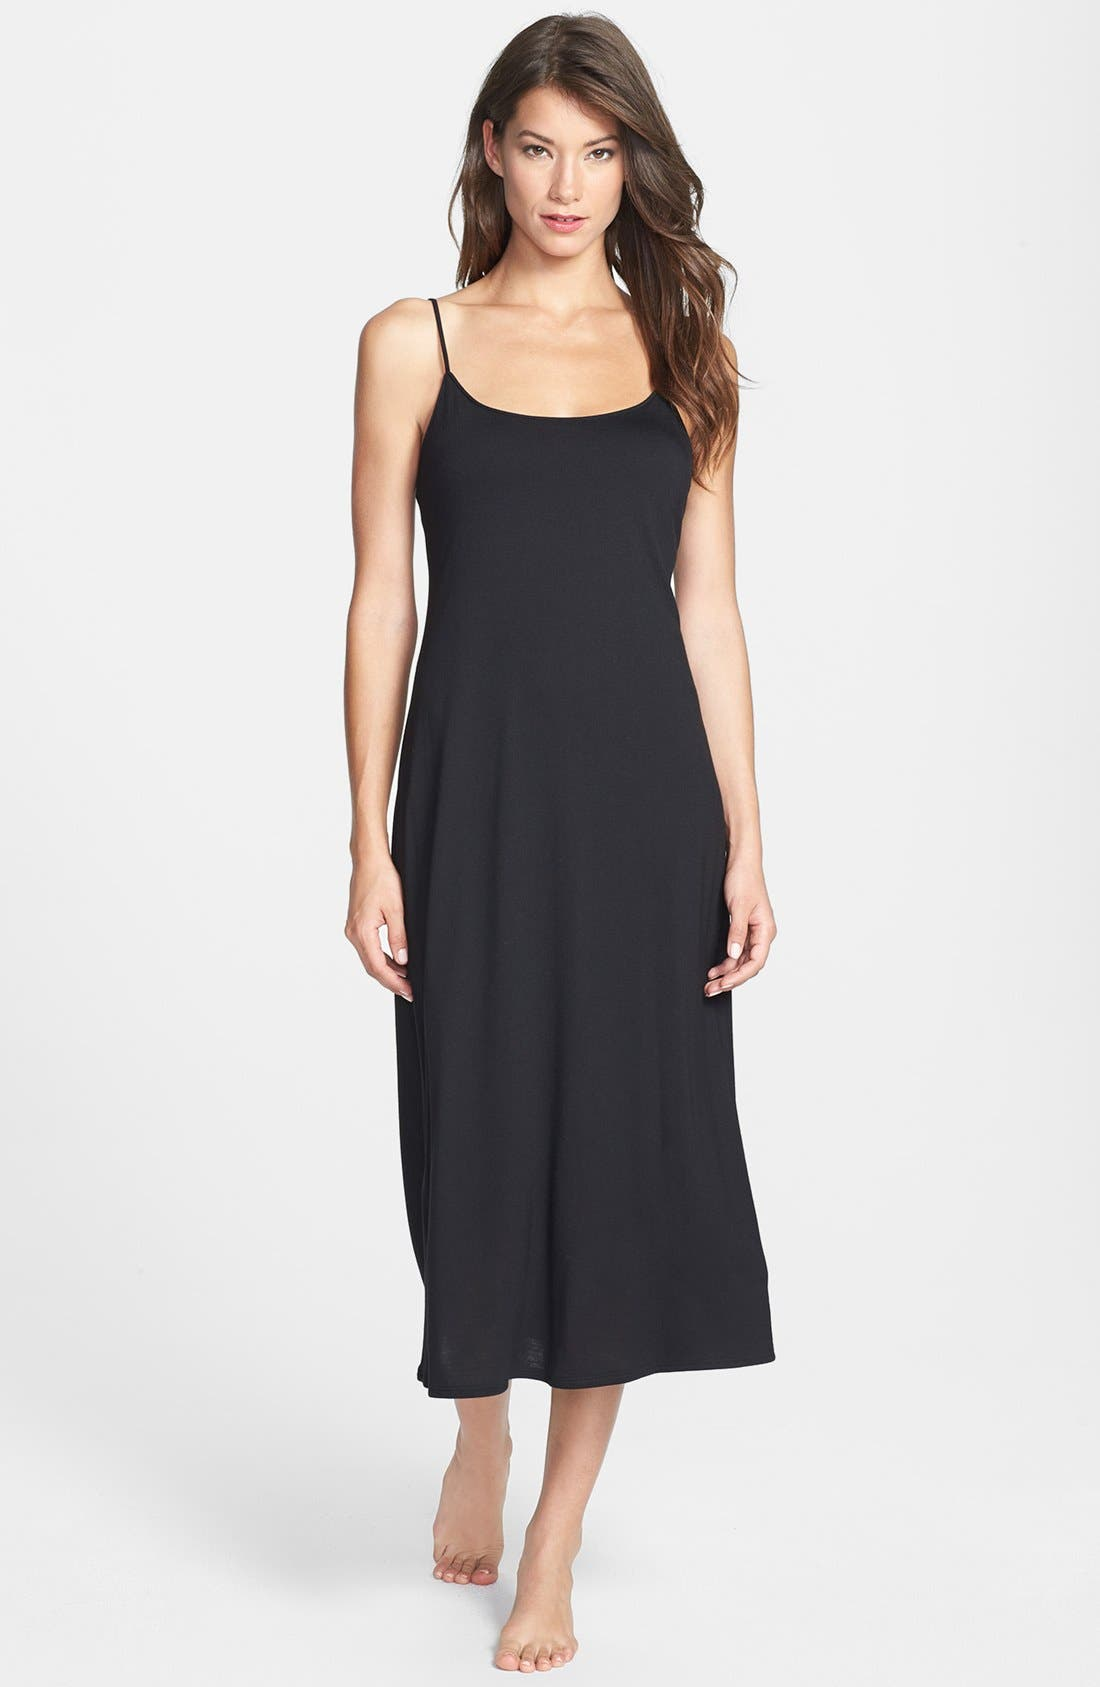 Shangri La Nightgown,                         Main,                         color, BLACK